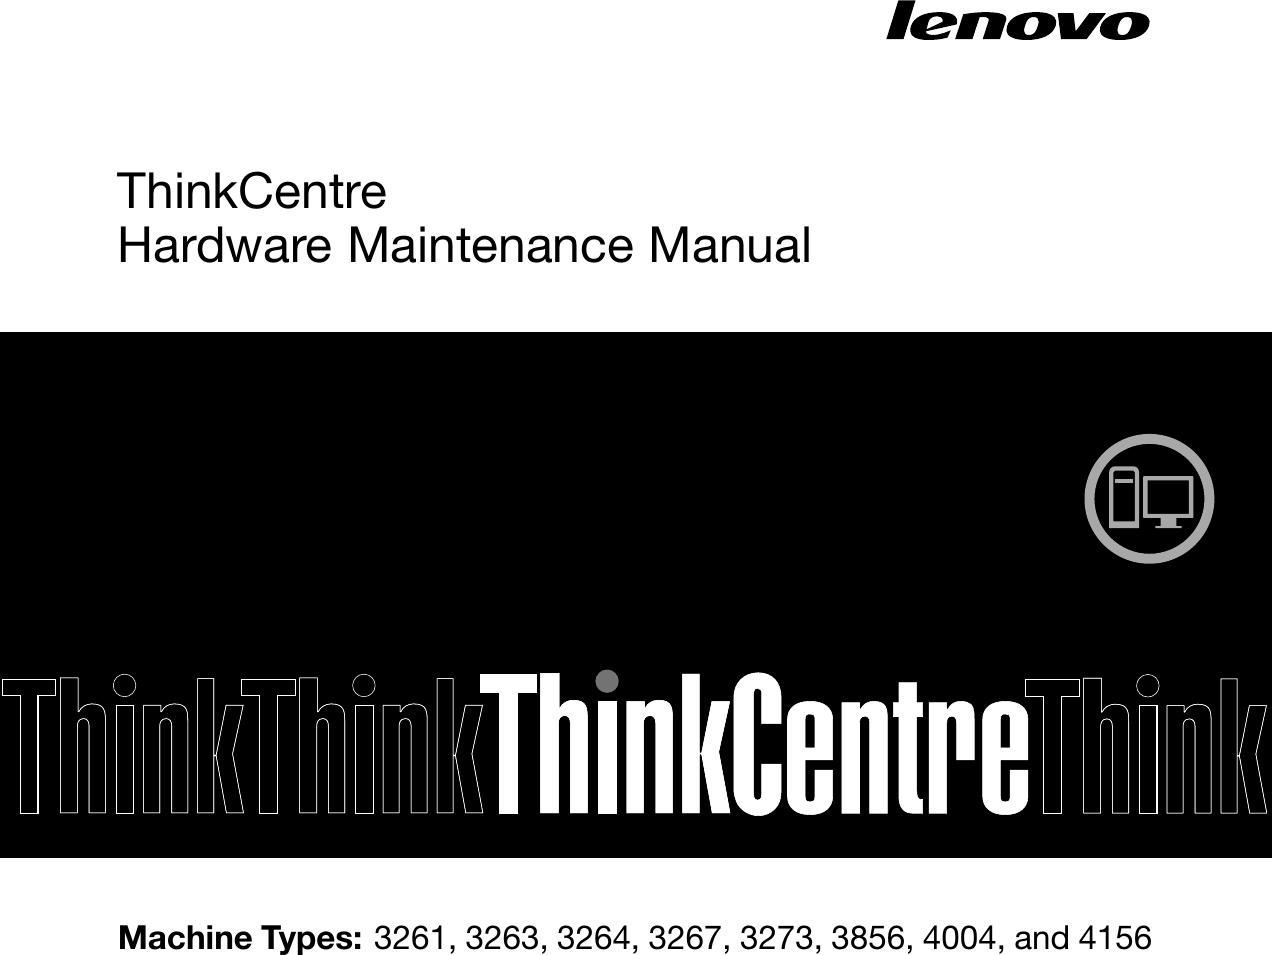 Lenovo M72E Tiny Hmm User Manual Desktop (Think Centre) Type 0896